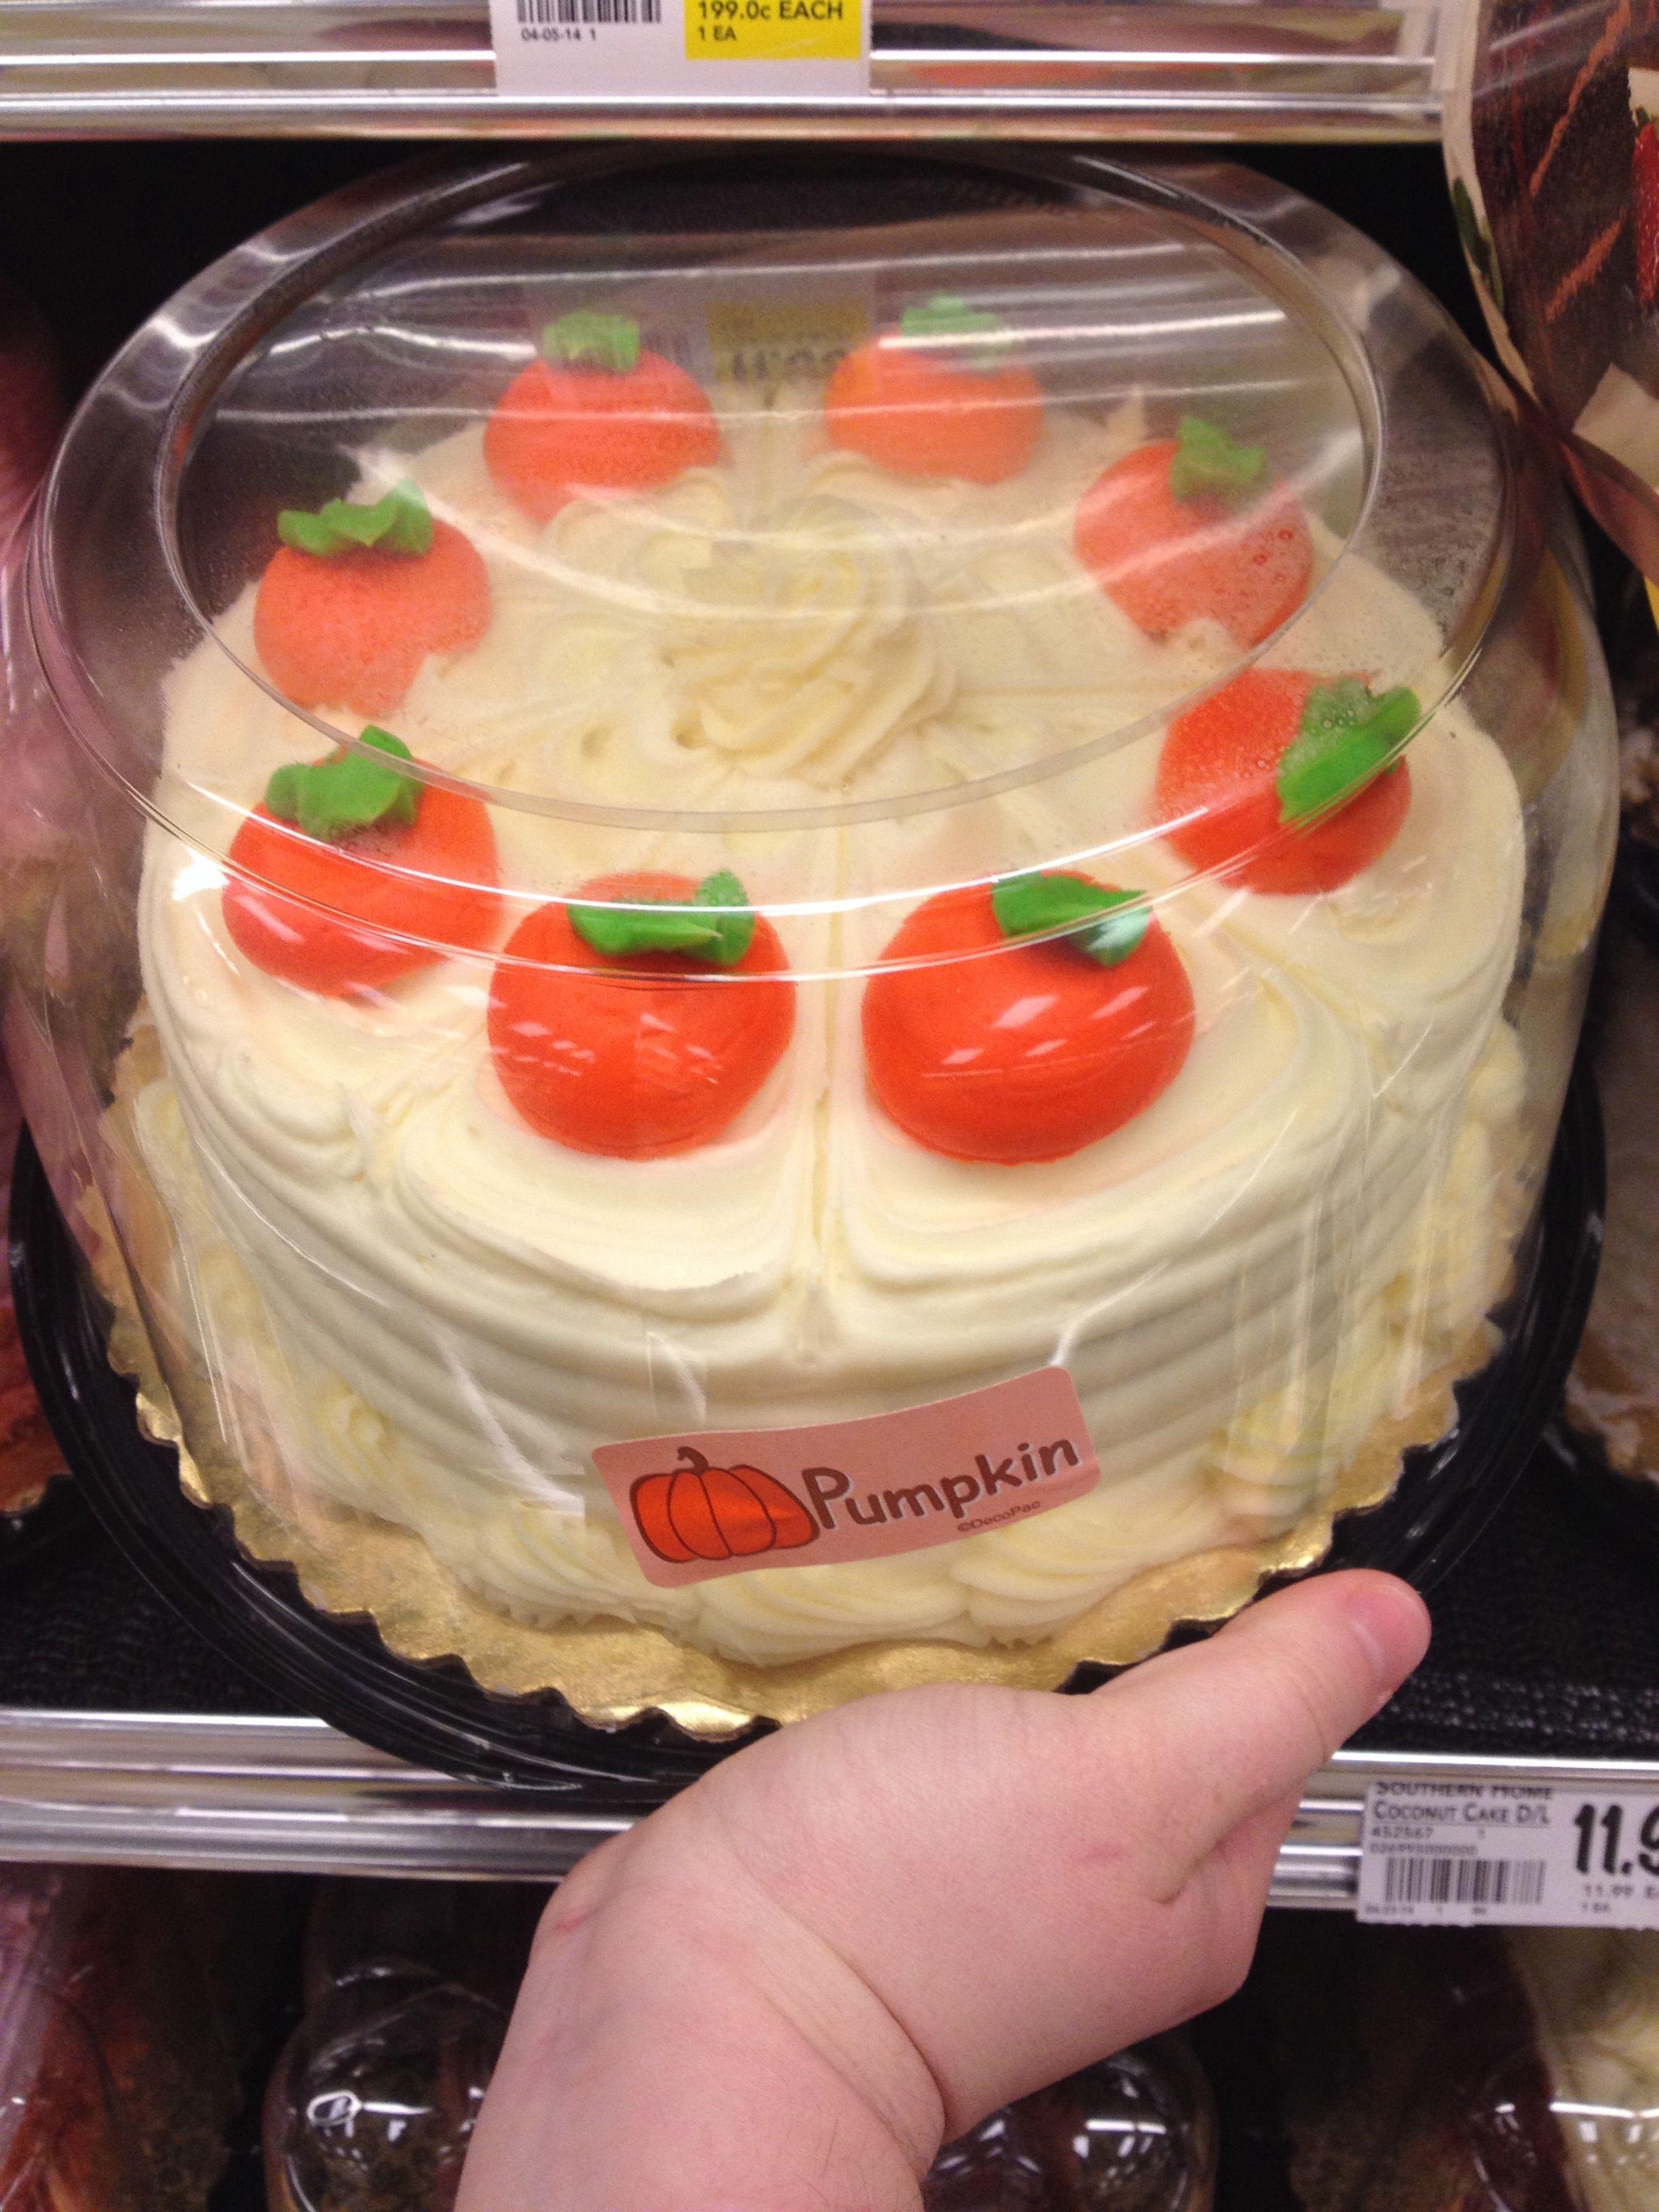 Pumpkin cake design